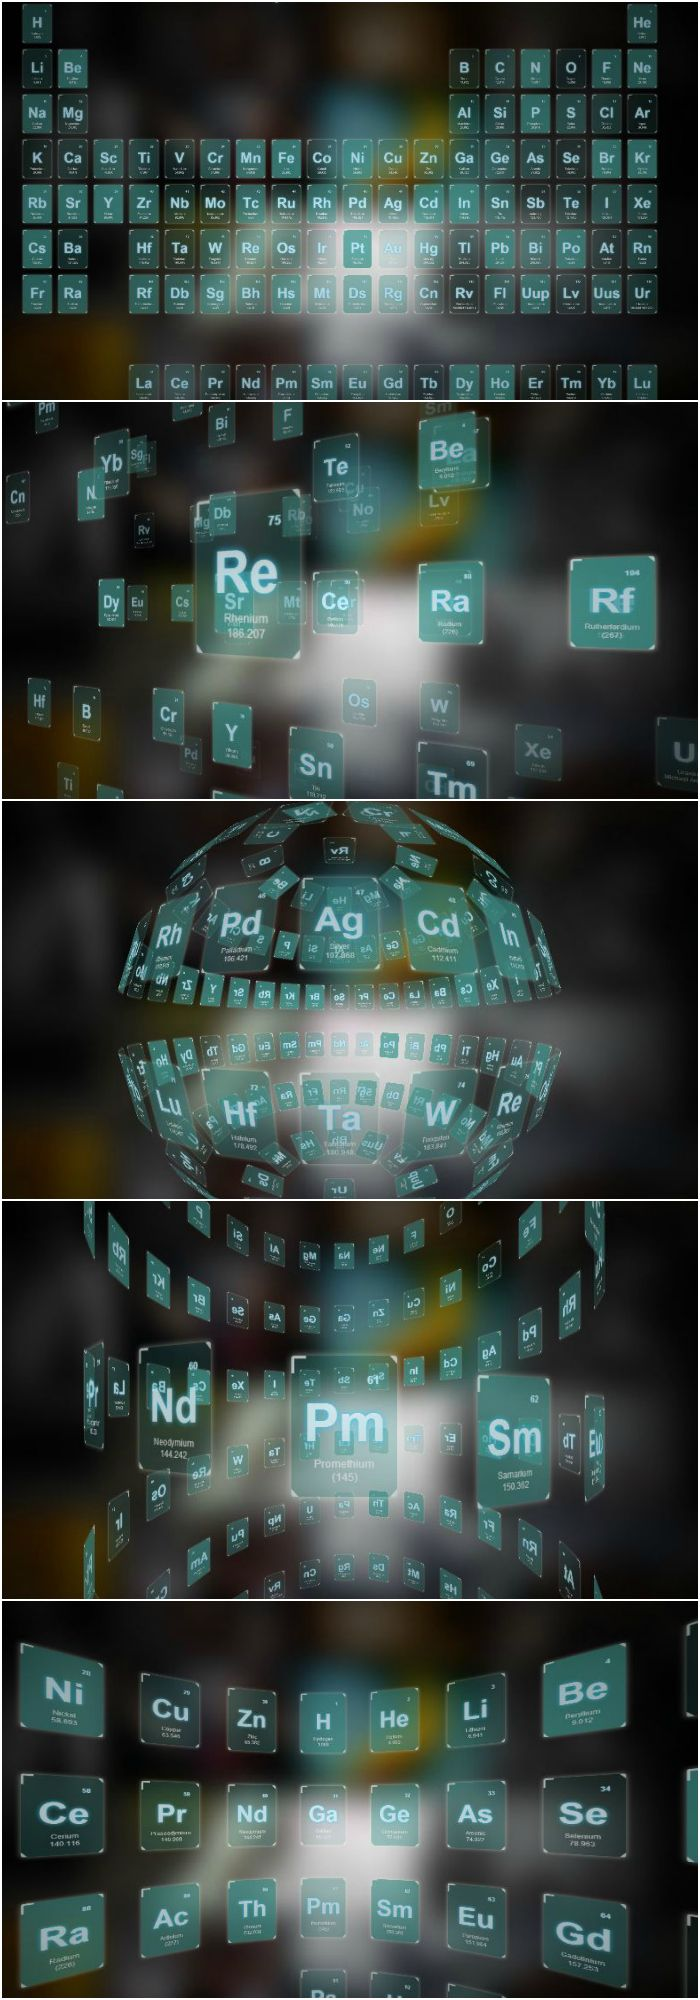 Html5 tabla peridica periodic table programming web web html5 tabla peridica periodic table programming web gamestrikefo Images